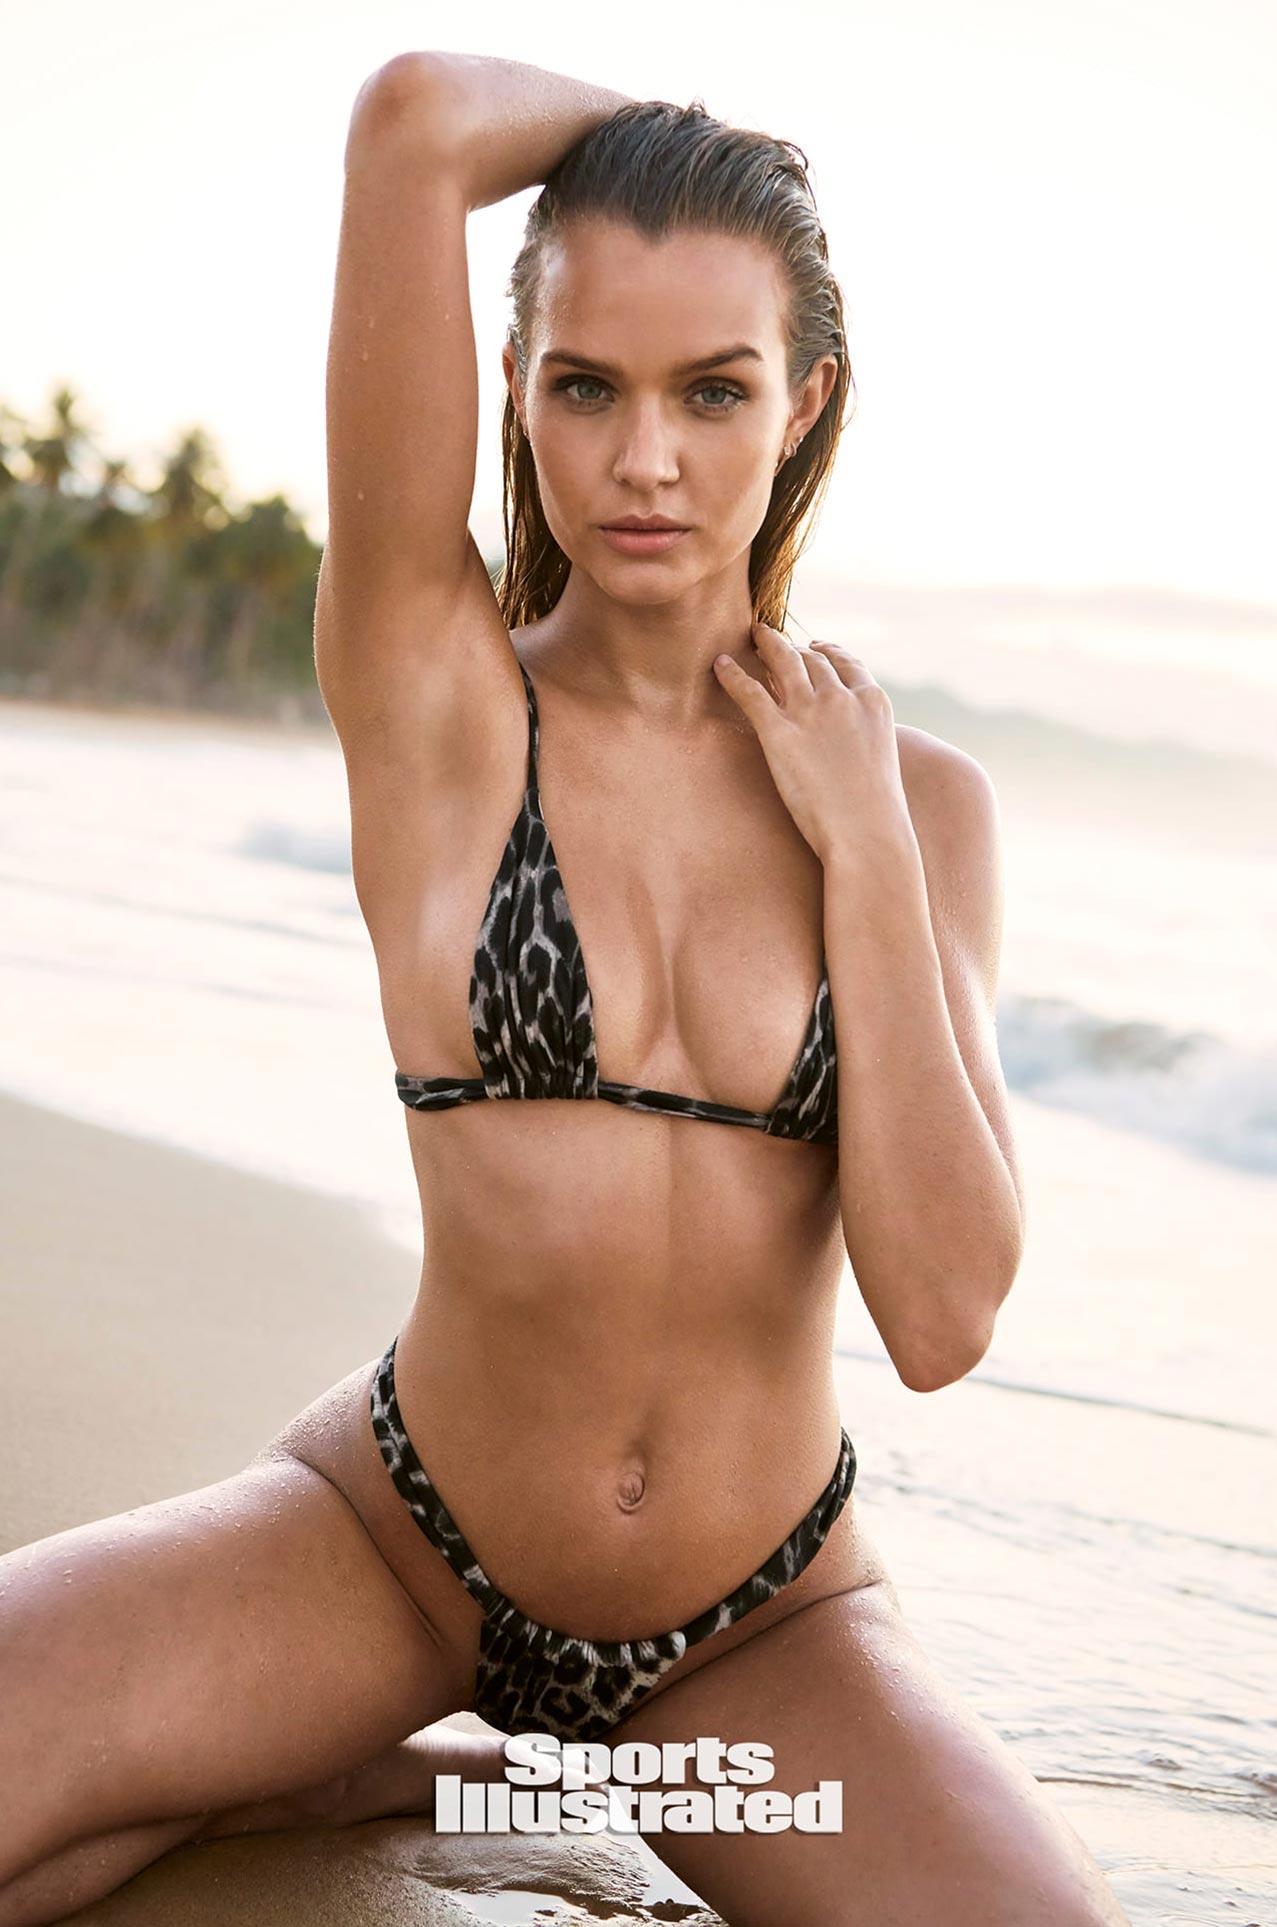 Жозефин Скривер в каталоге купальников Sports Illustrated Swimsuit 2020 / фото 27